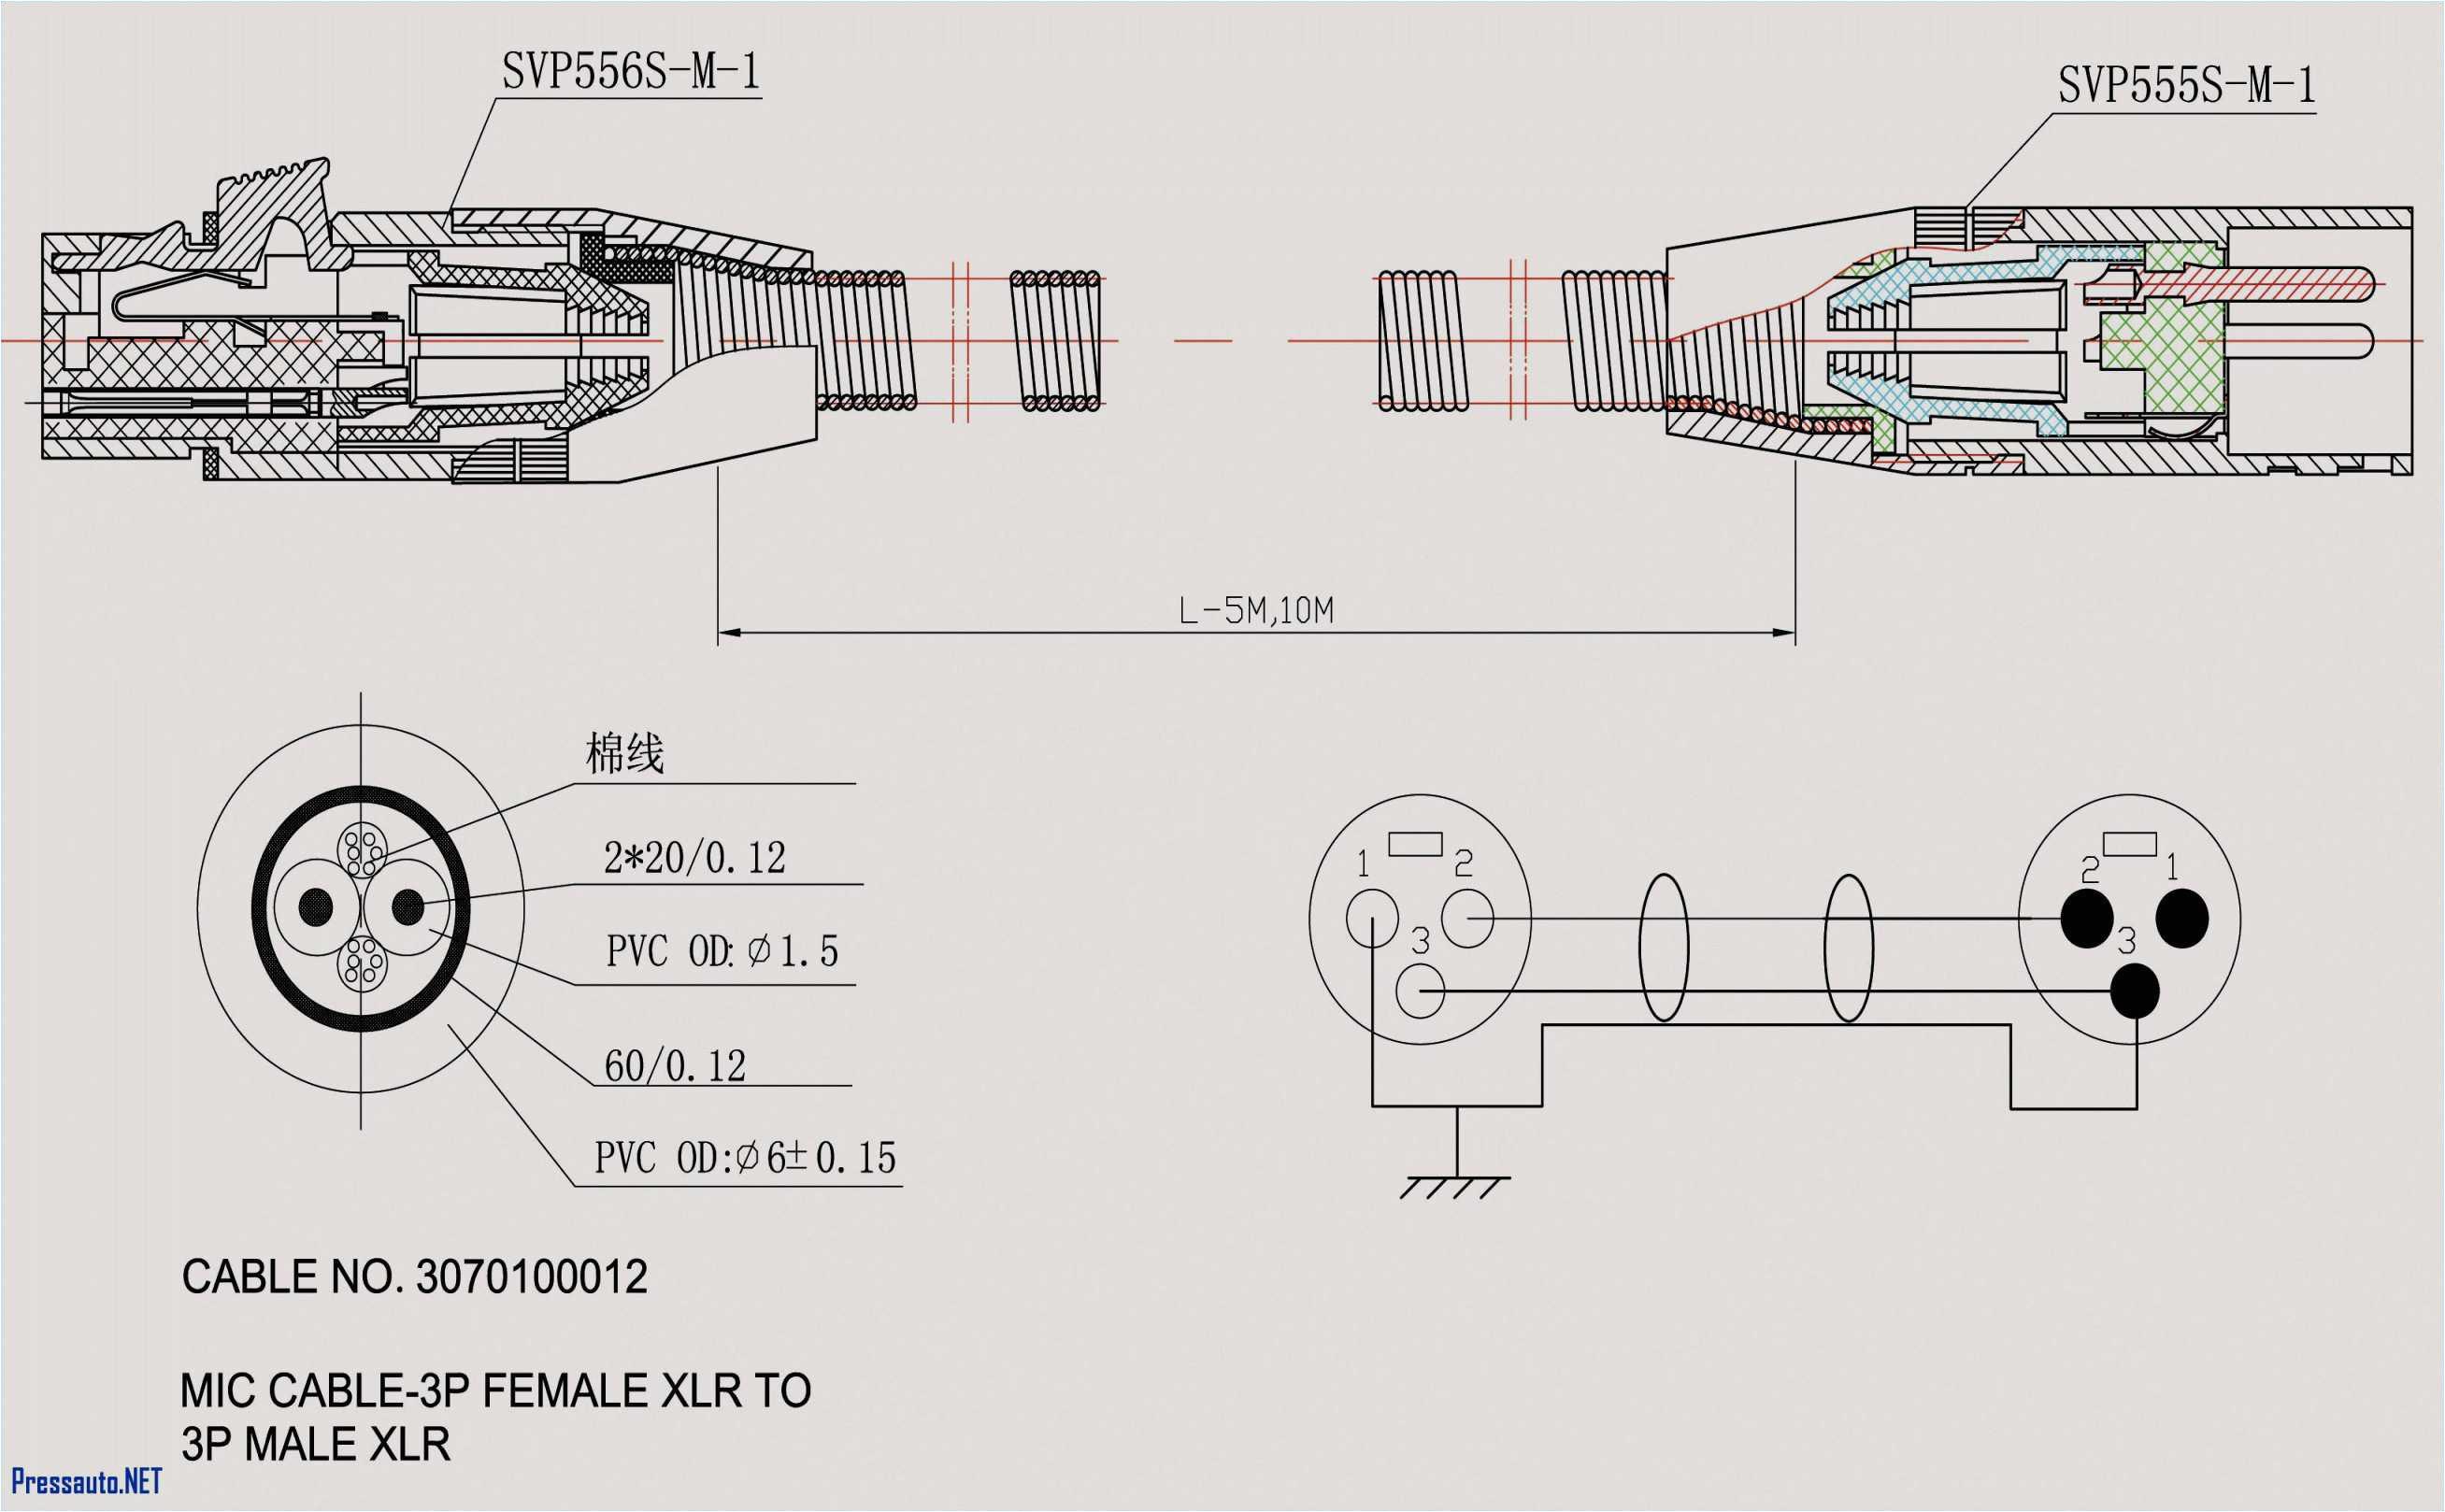 arco vr 406 wiring diagram wiring diagram page arco vr 406 wiring diagram